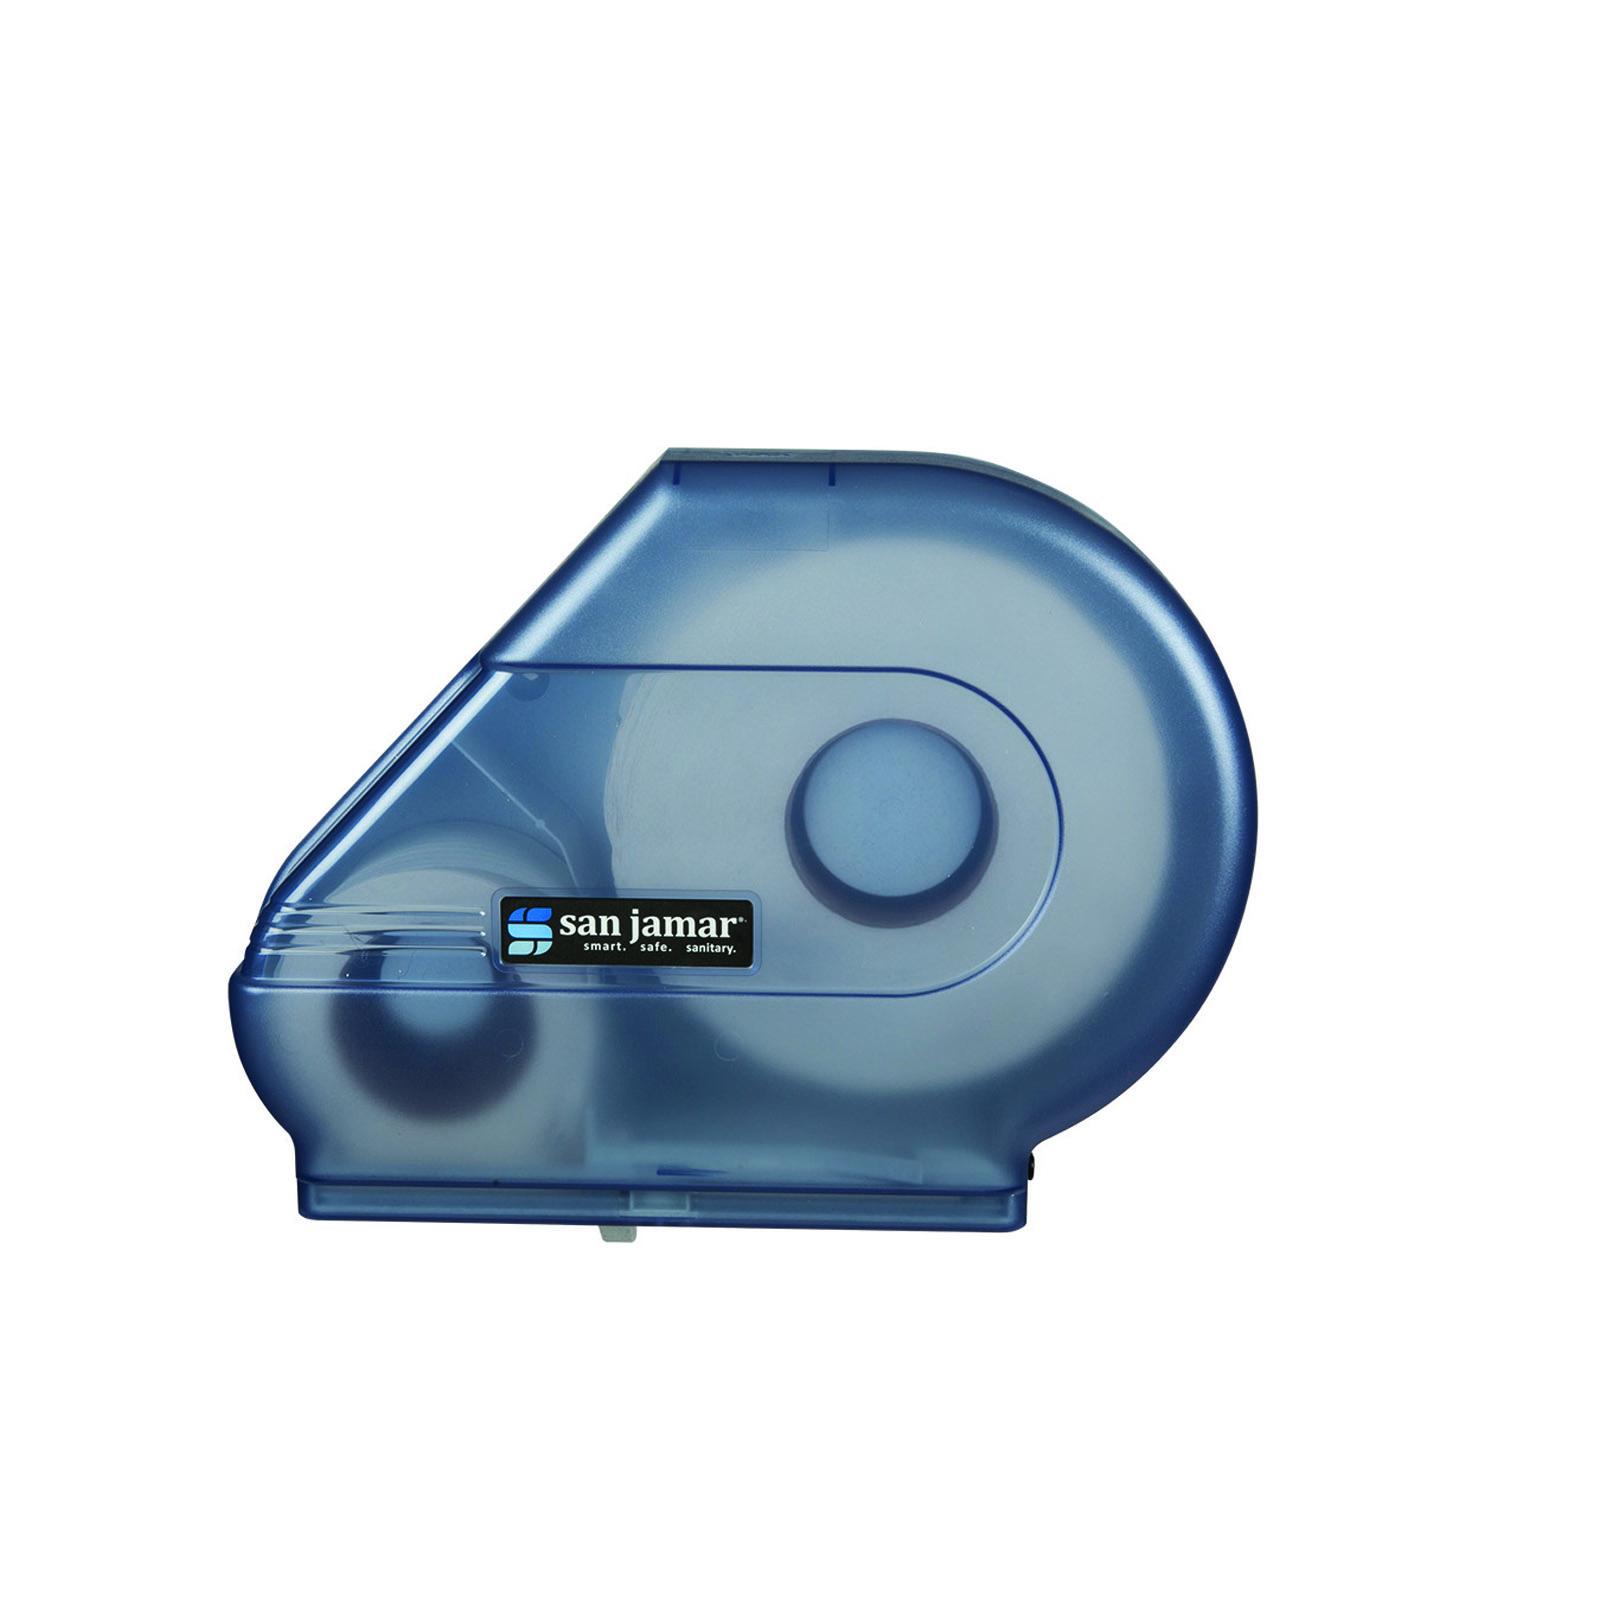 San Jamar R3000TBL toilet tissue dispenser